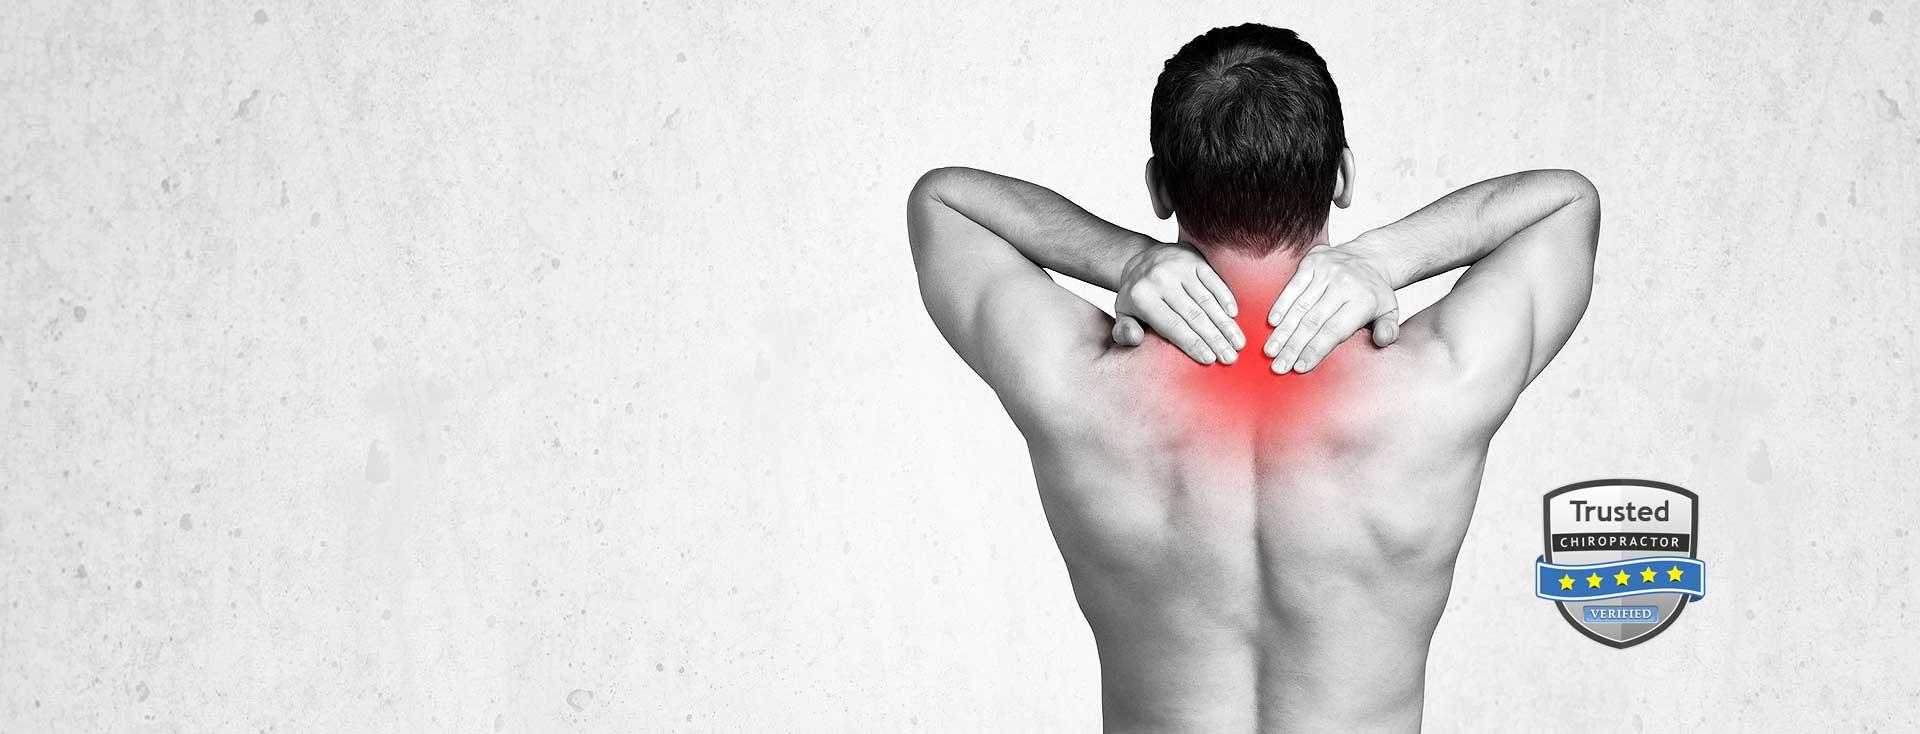 ARTHRITIS AND RHEUMATIC DISEASES